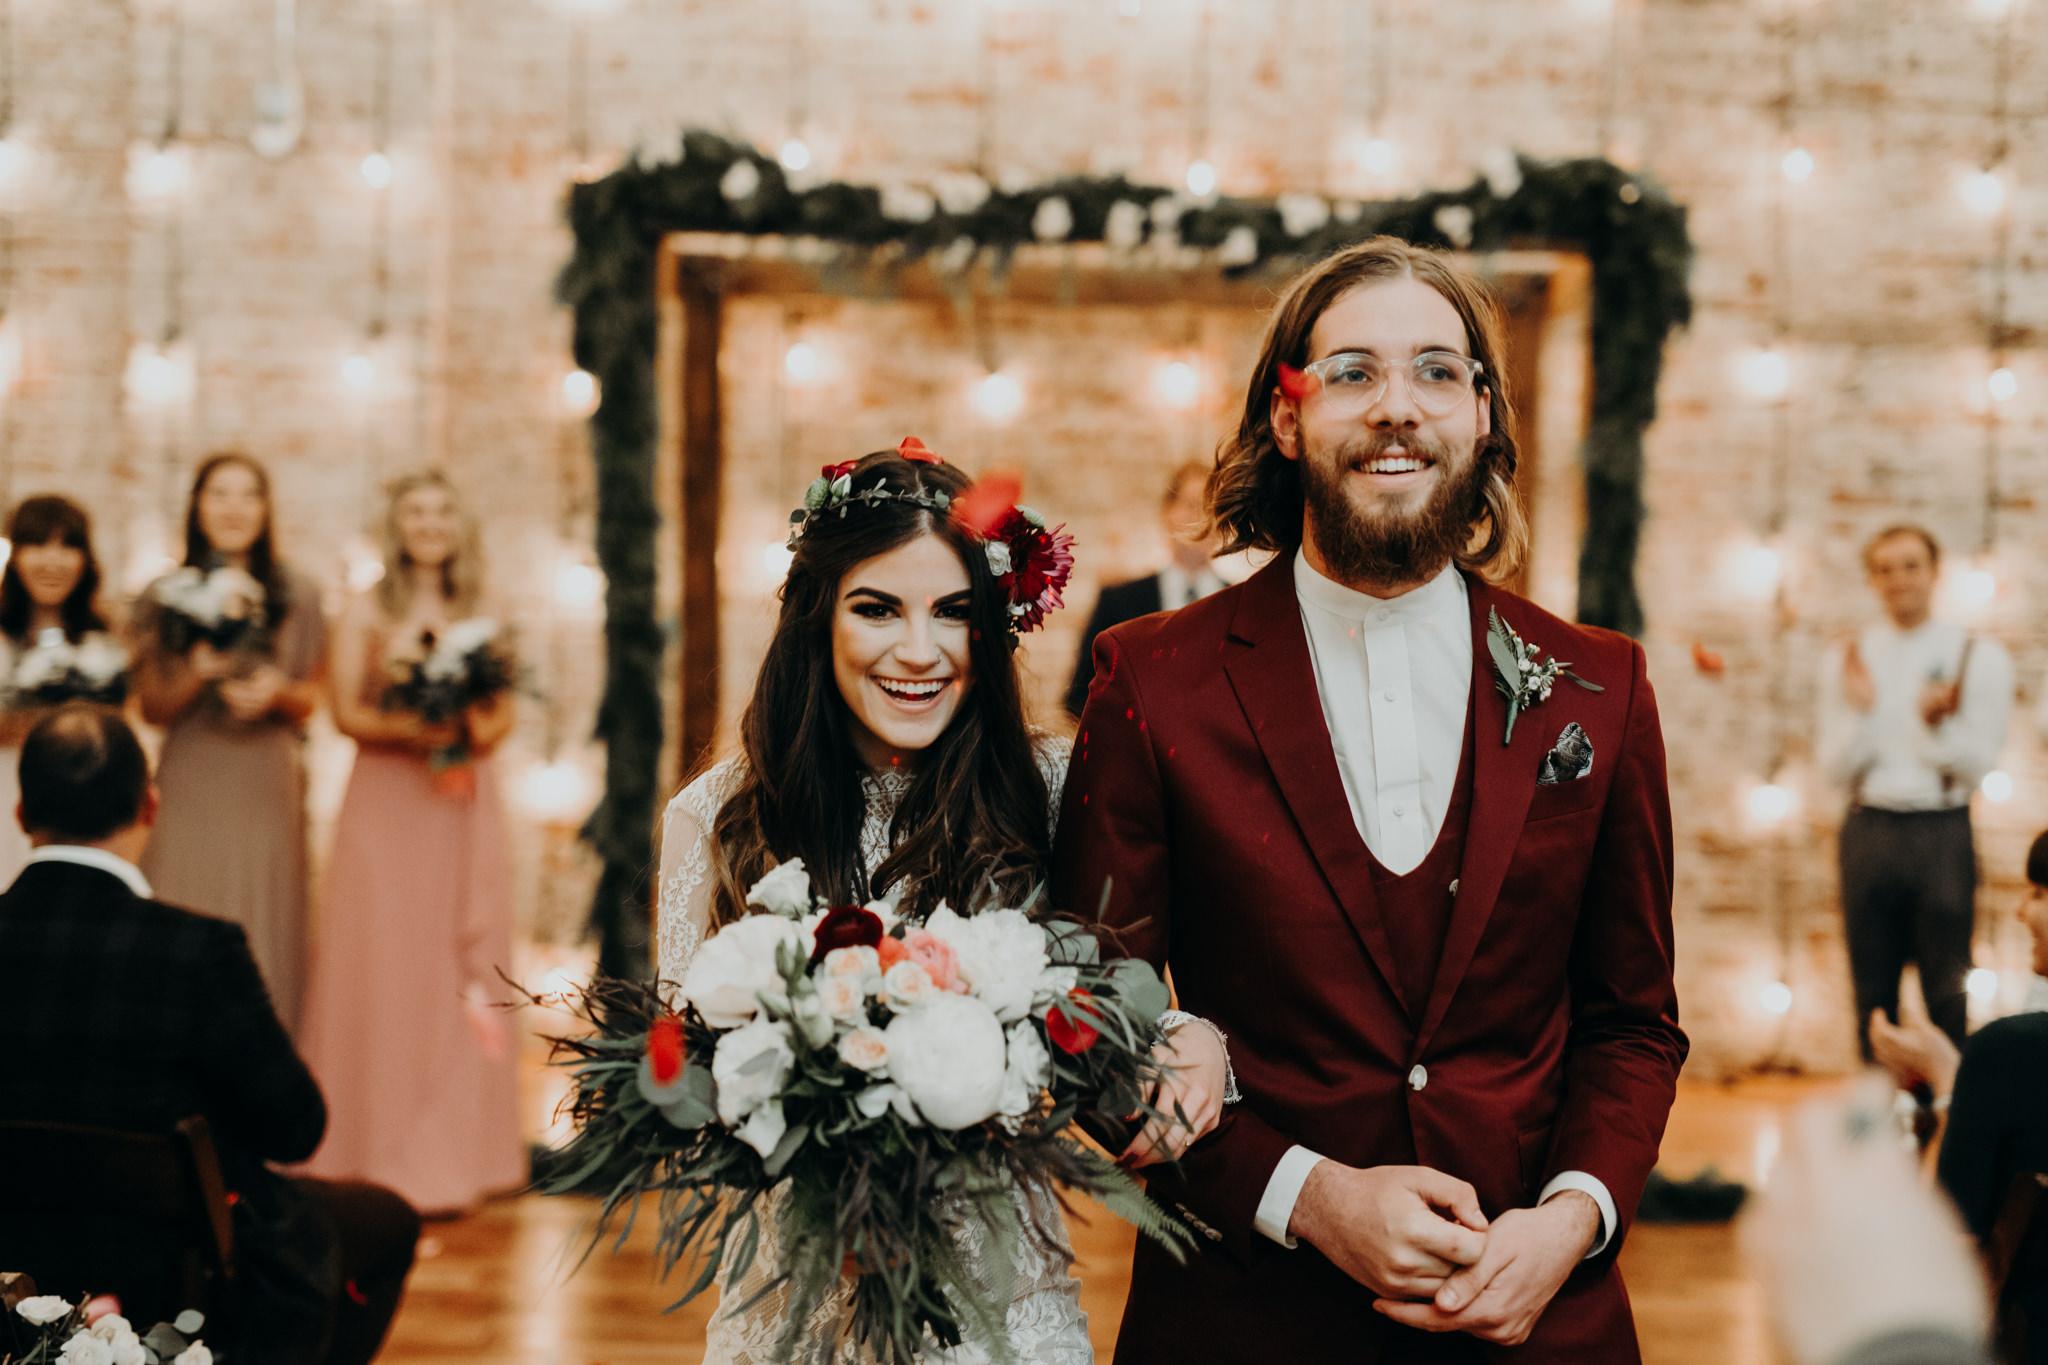 couple-wedding-indie-wedding-northern-california-113.jpg